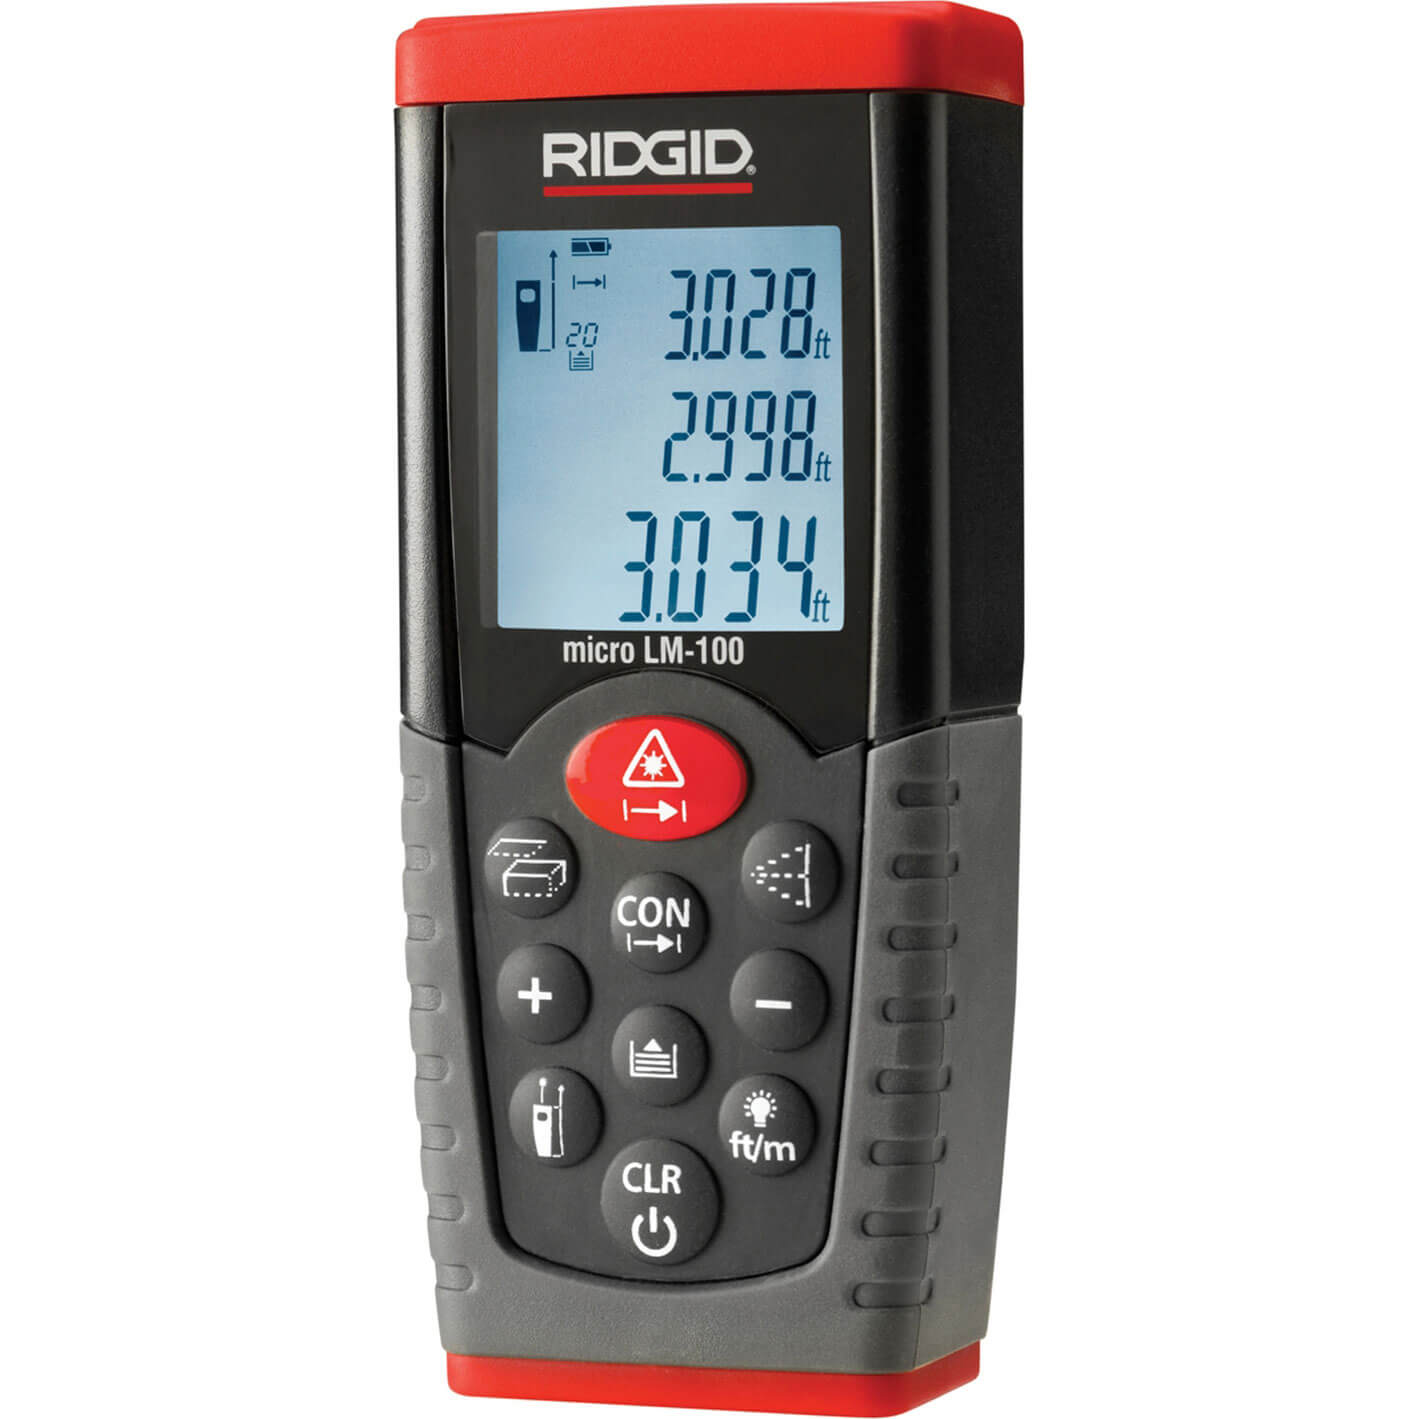 Ridgid Micro LM-100 Distance Laser Measurer 50m Range 50m / 164ft